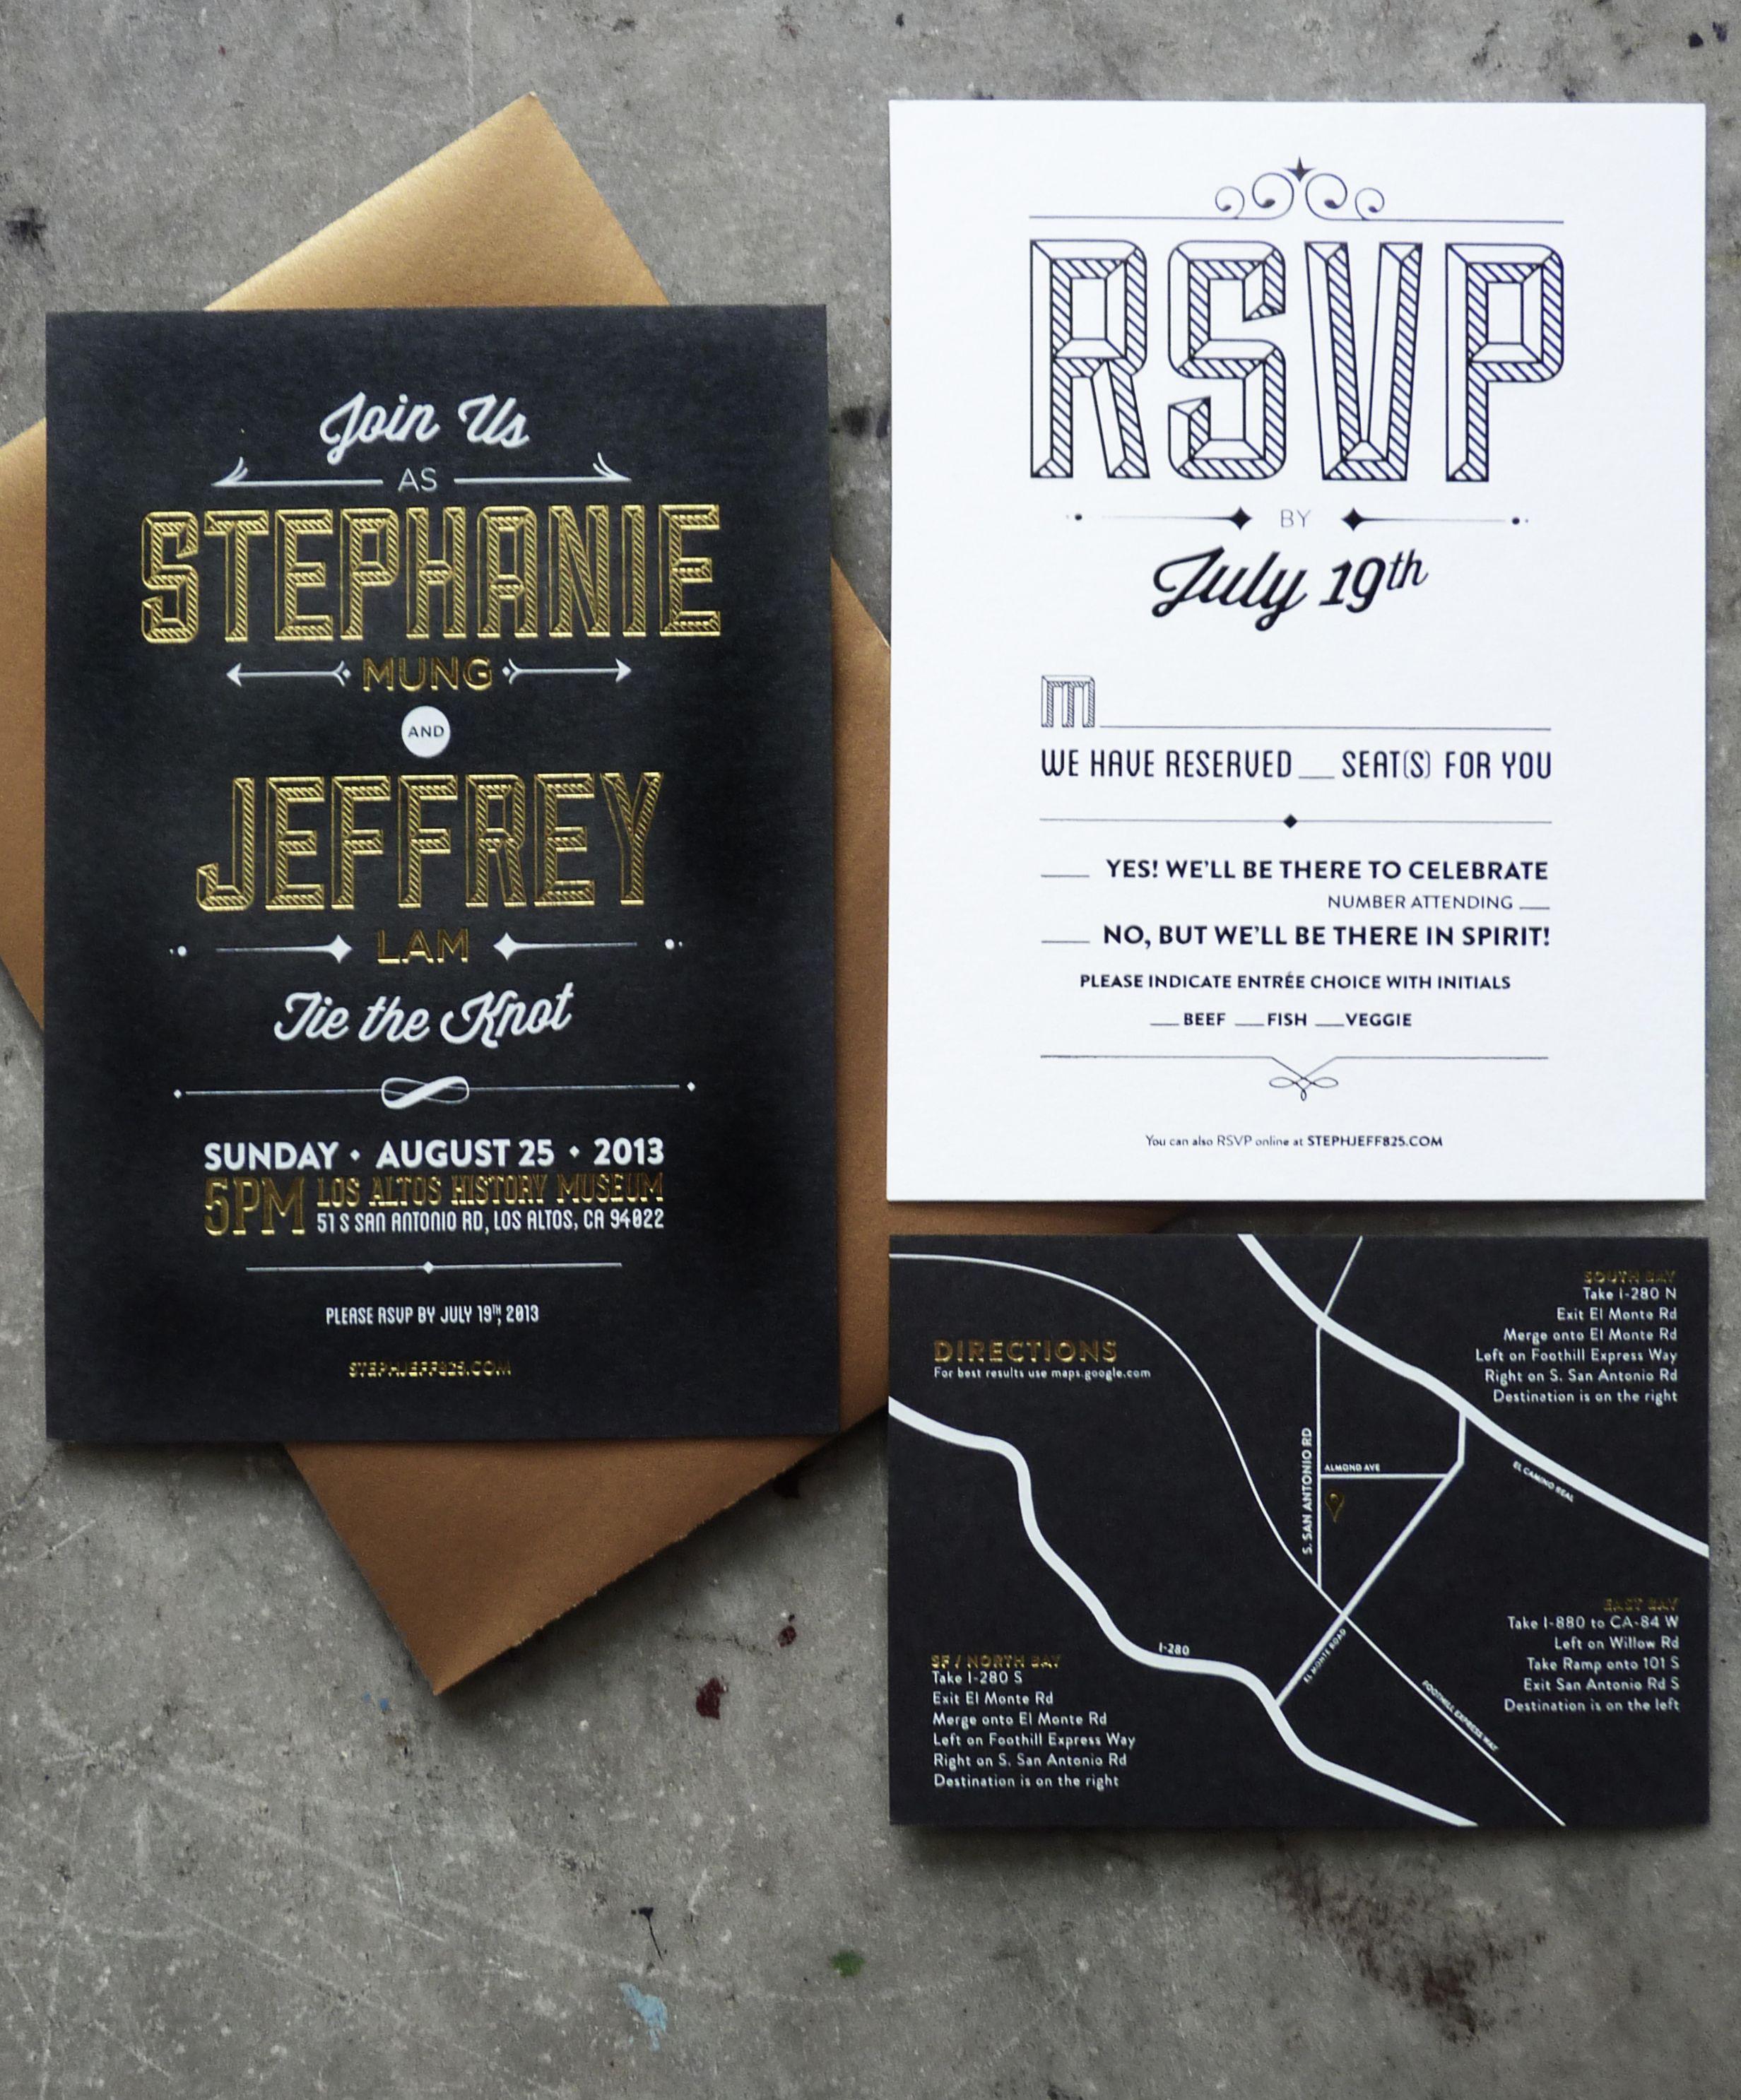 Foil stamped wedding invitations gold white u black ink printed